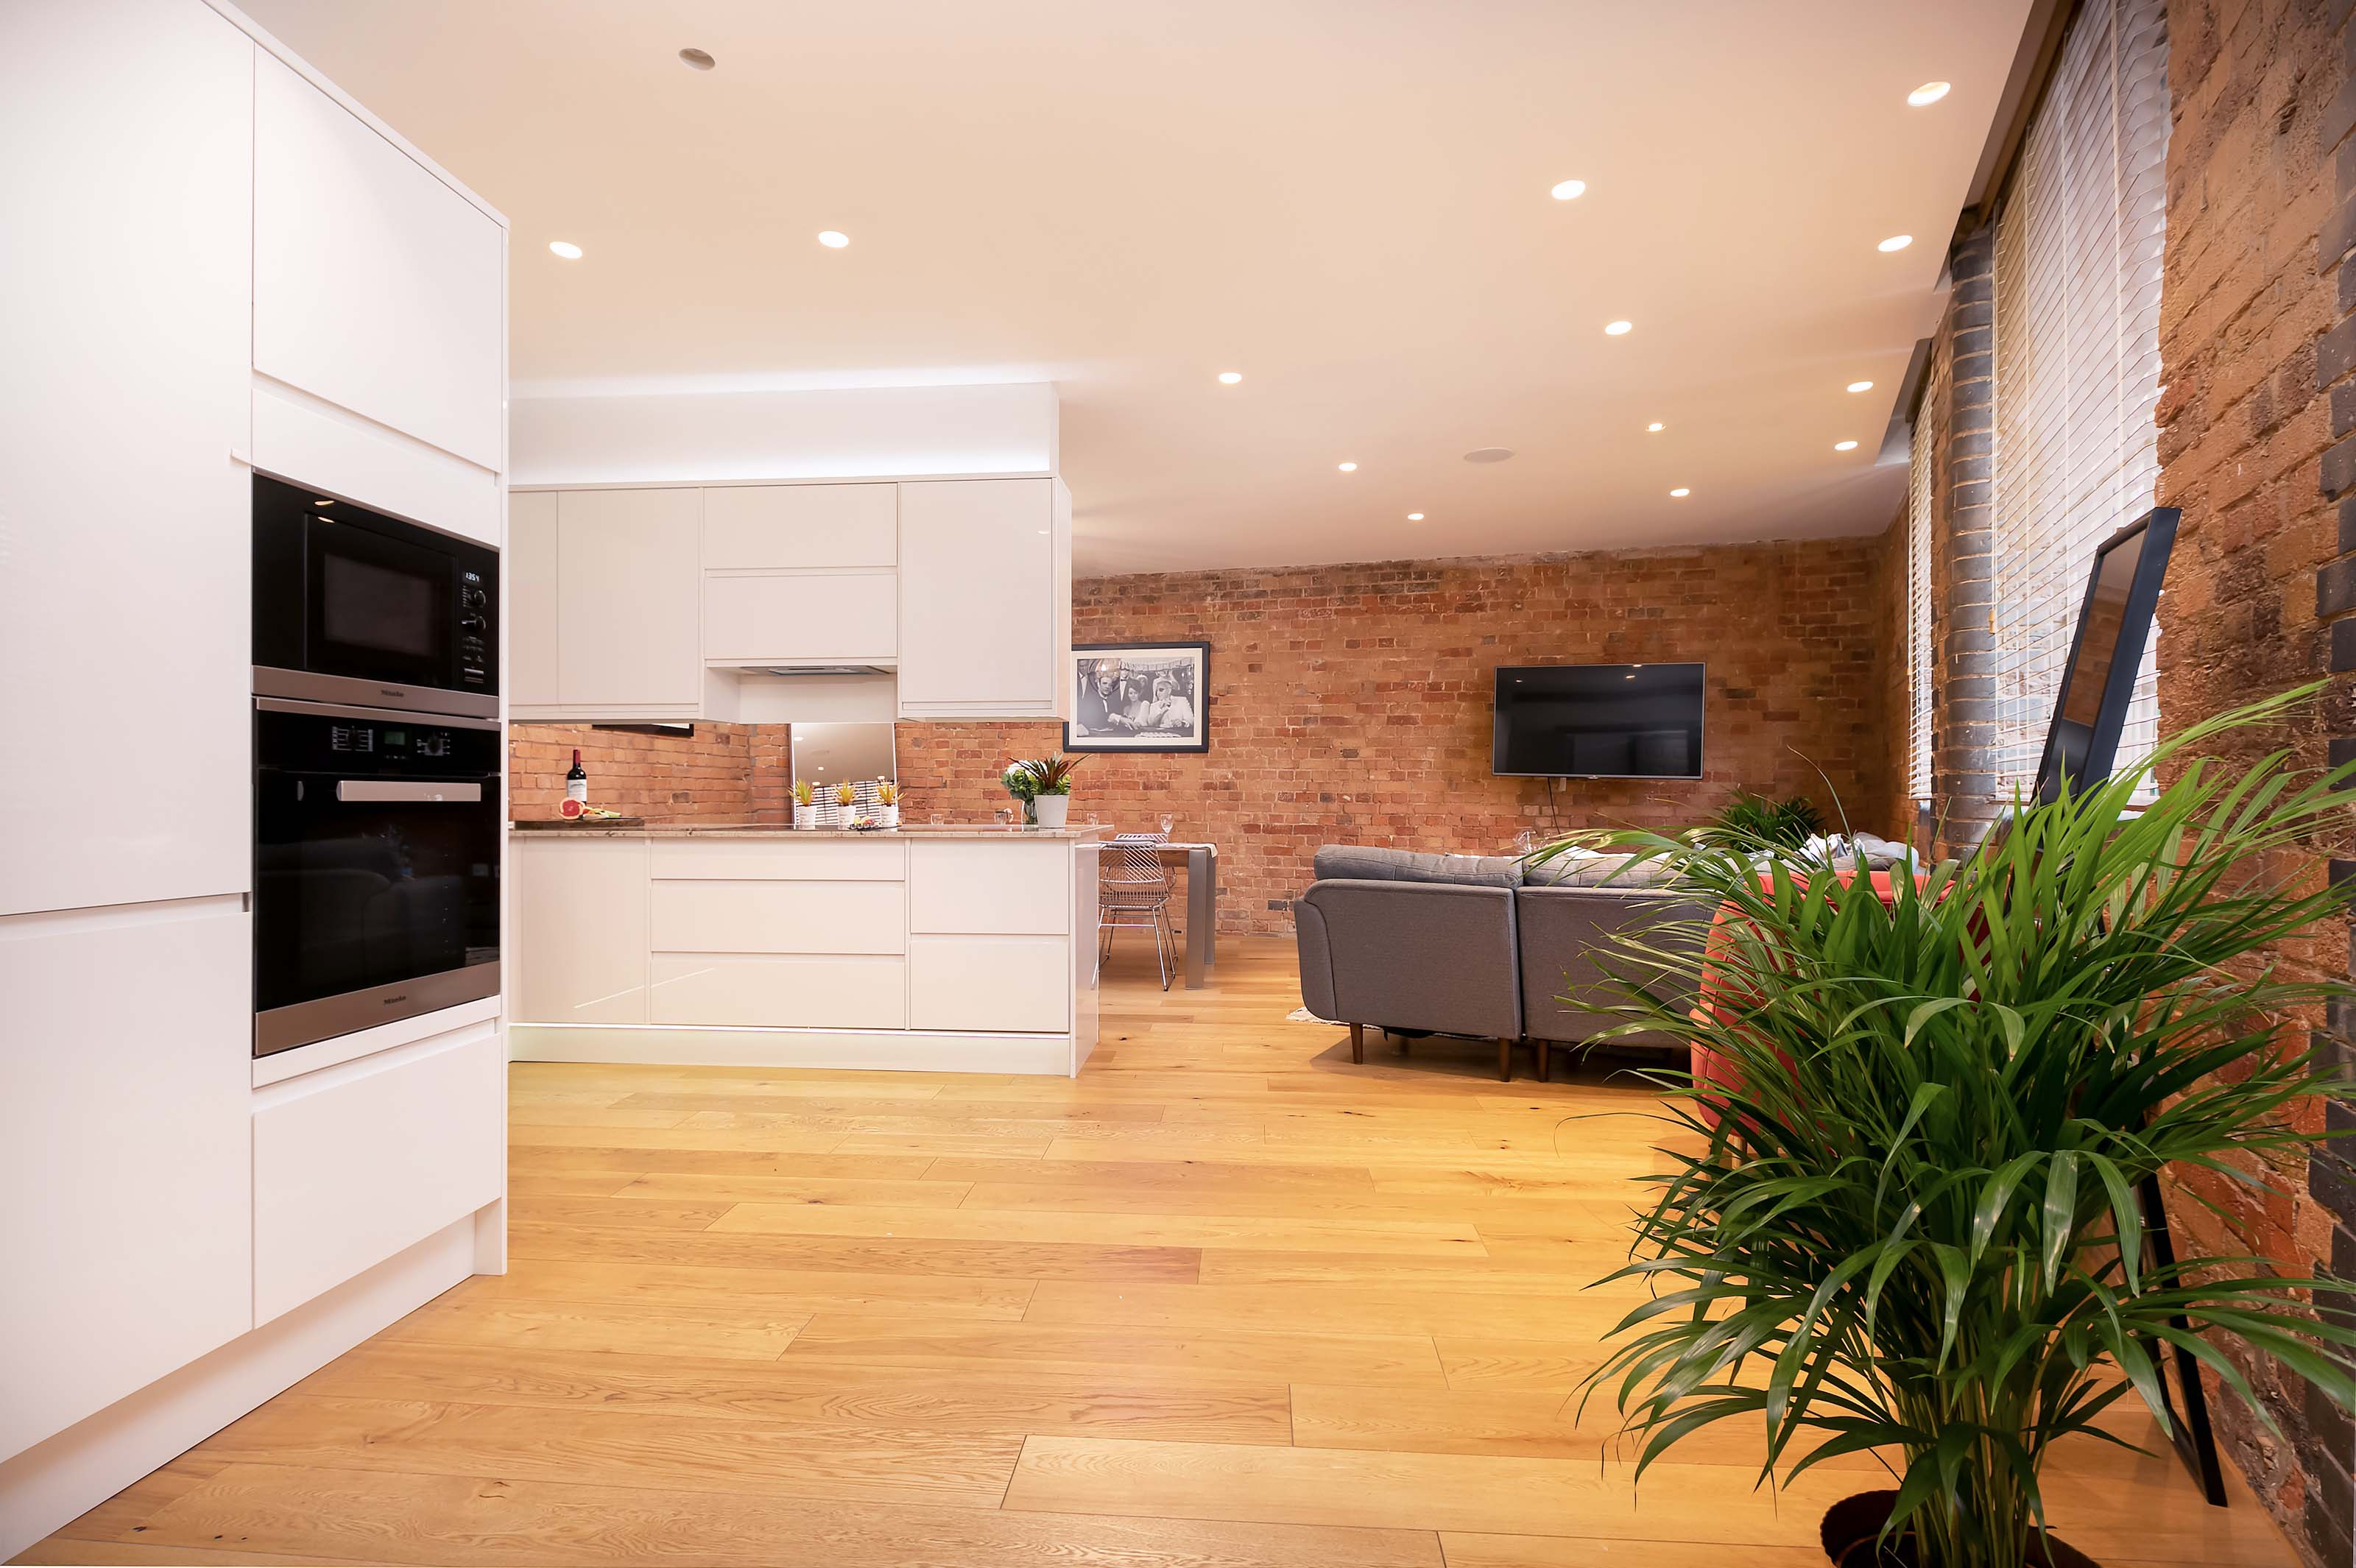 Lovelydays luxury service apartment rental - London - Fitzrovia - Wells Mews B - Lovelysuite - 2 bedrooms - 2 bathrooms - Luxury living room - 45660d0e374f - Lovelydays